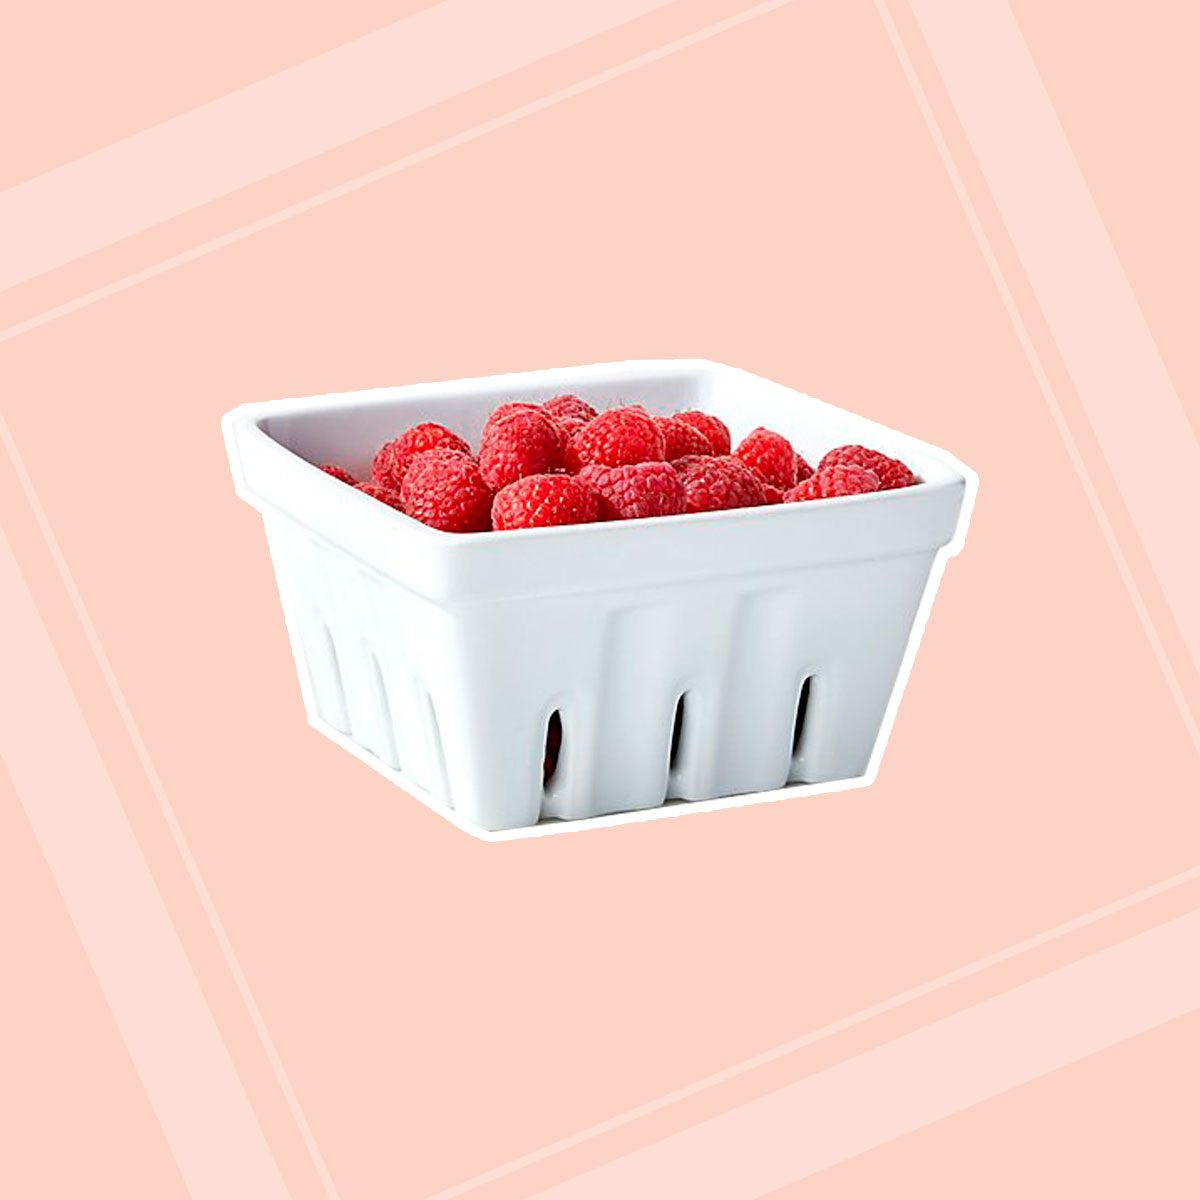 Berry Box Colander